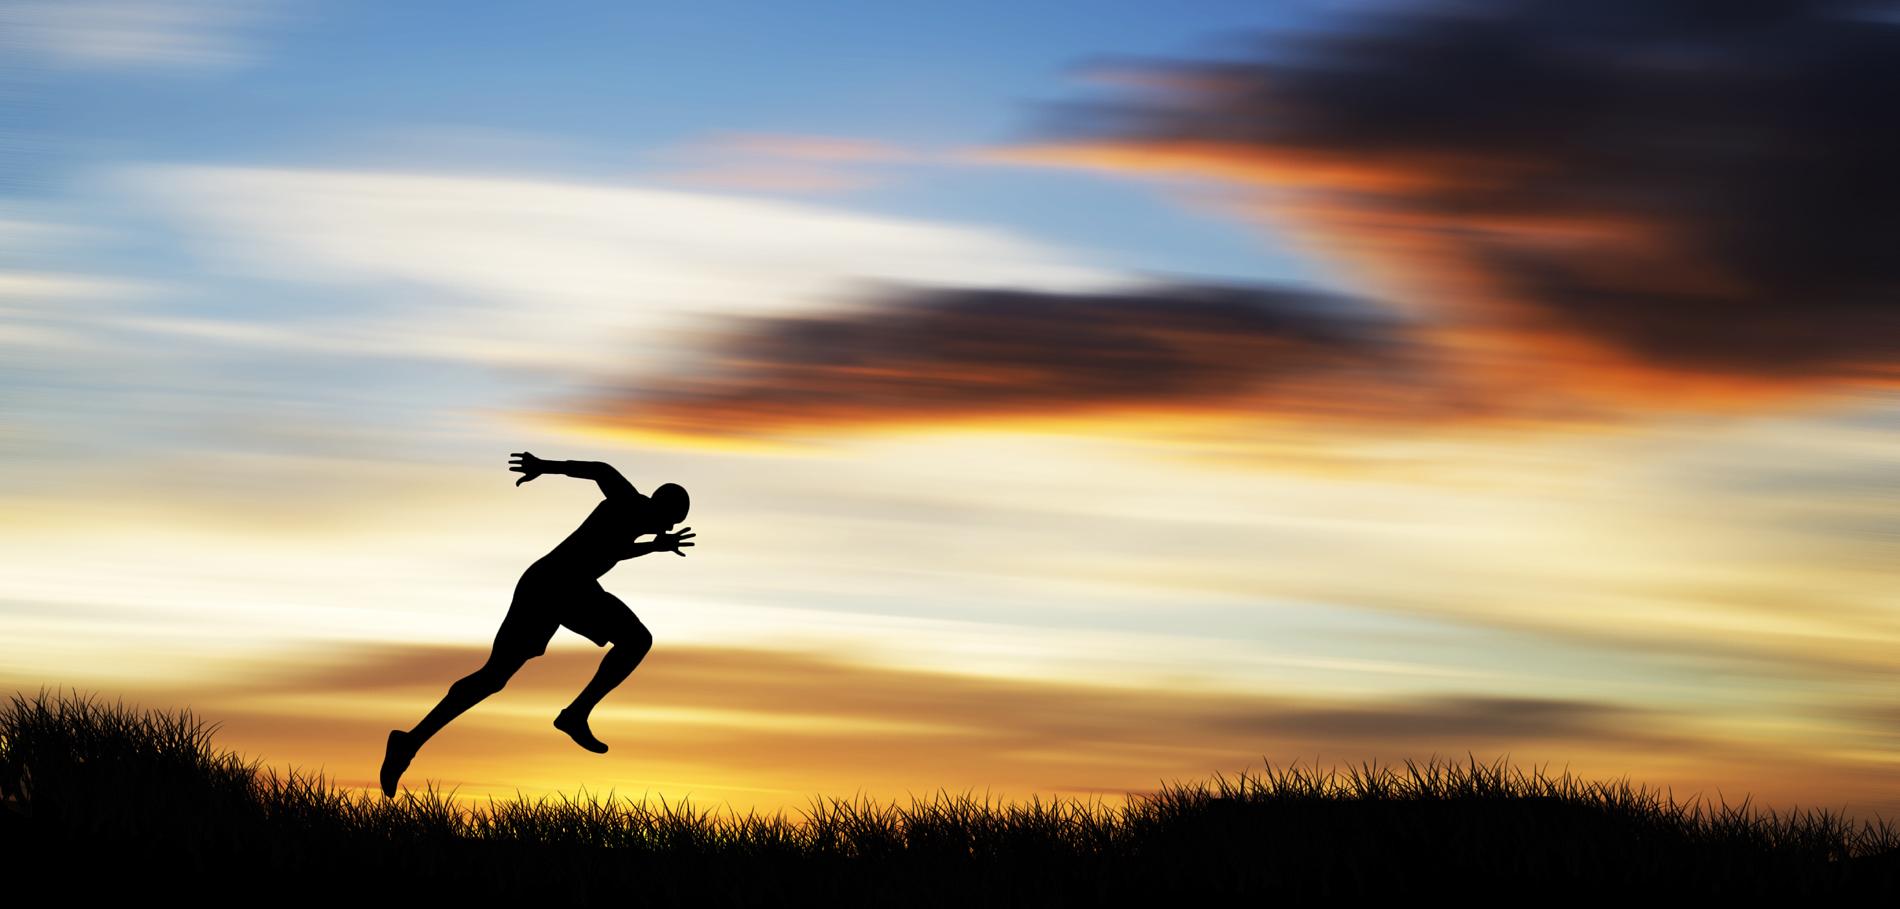 Sunset-running-against-people-silhouette.jpg